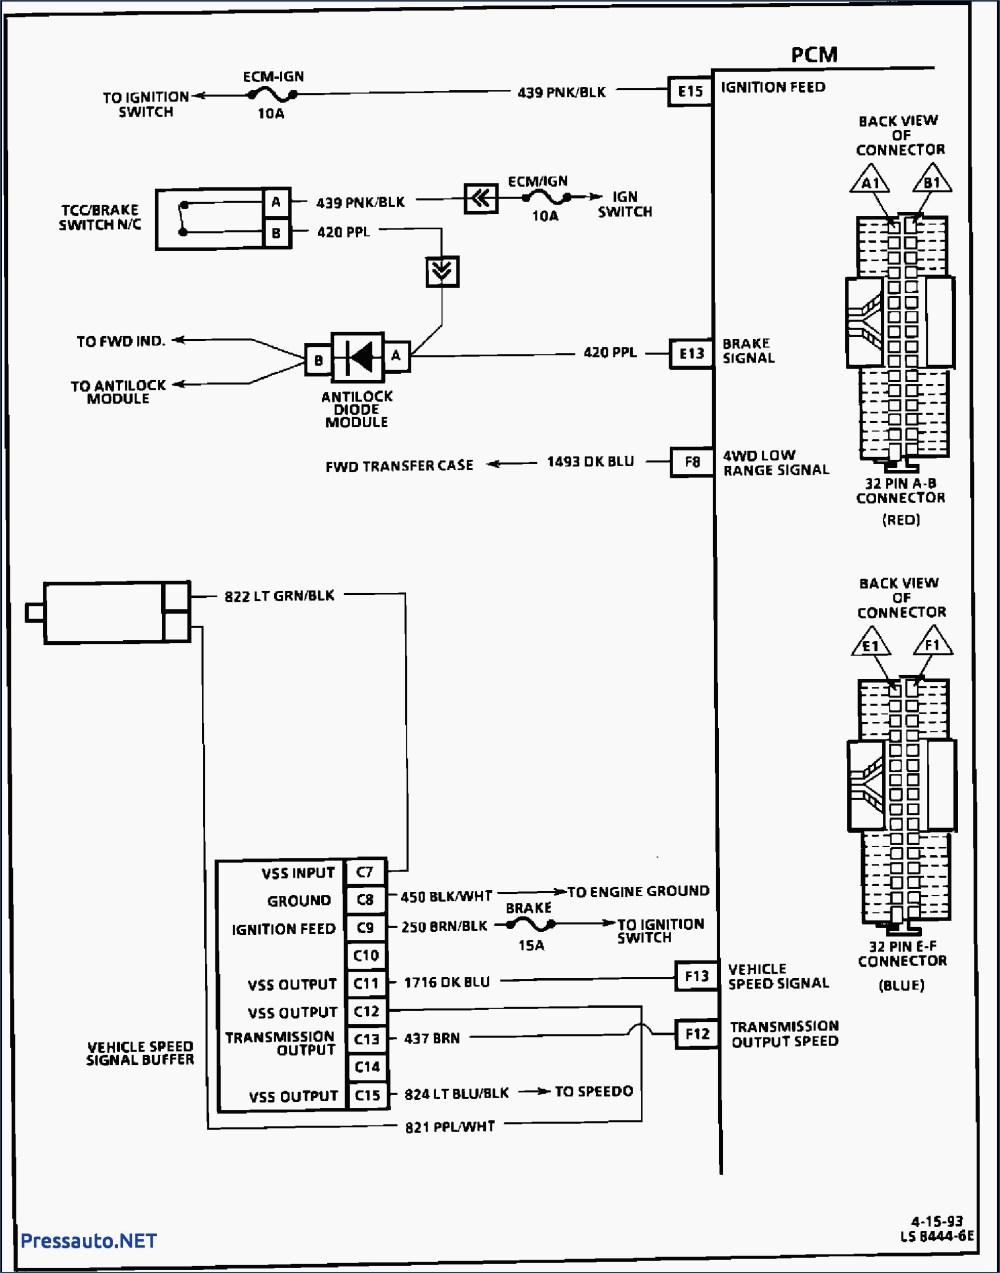 medium resolution of 4l80e wiring harness diagram solutions